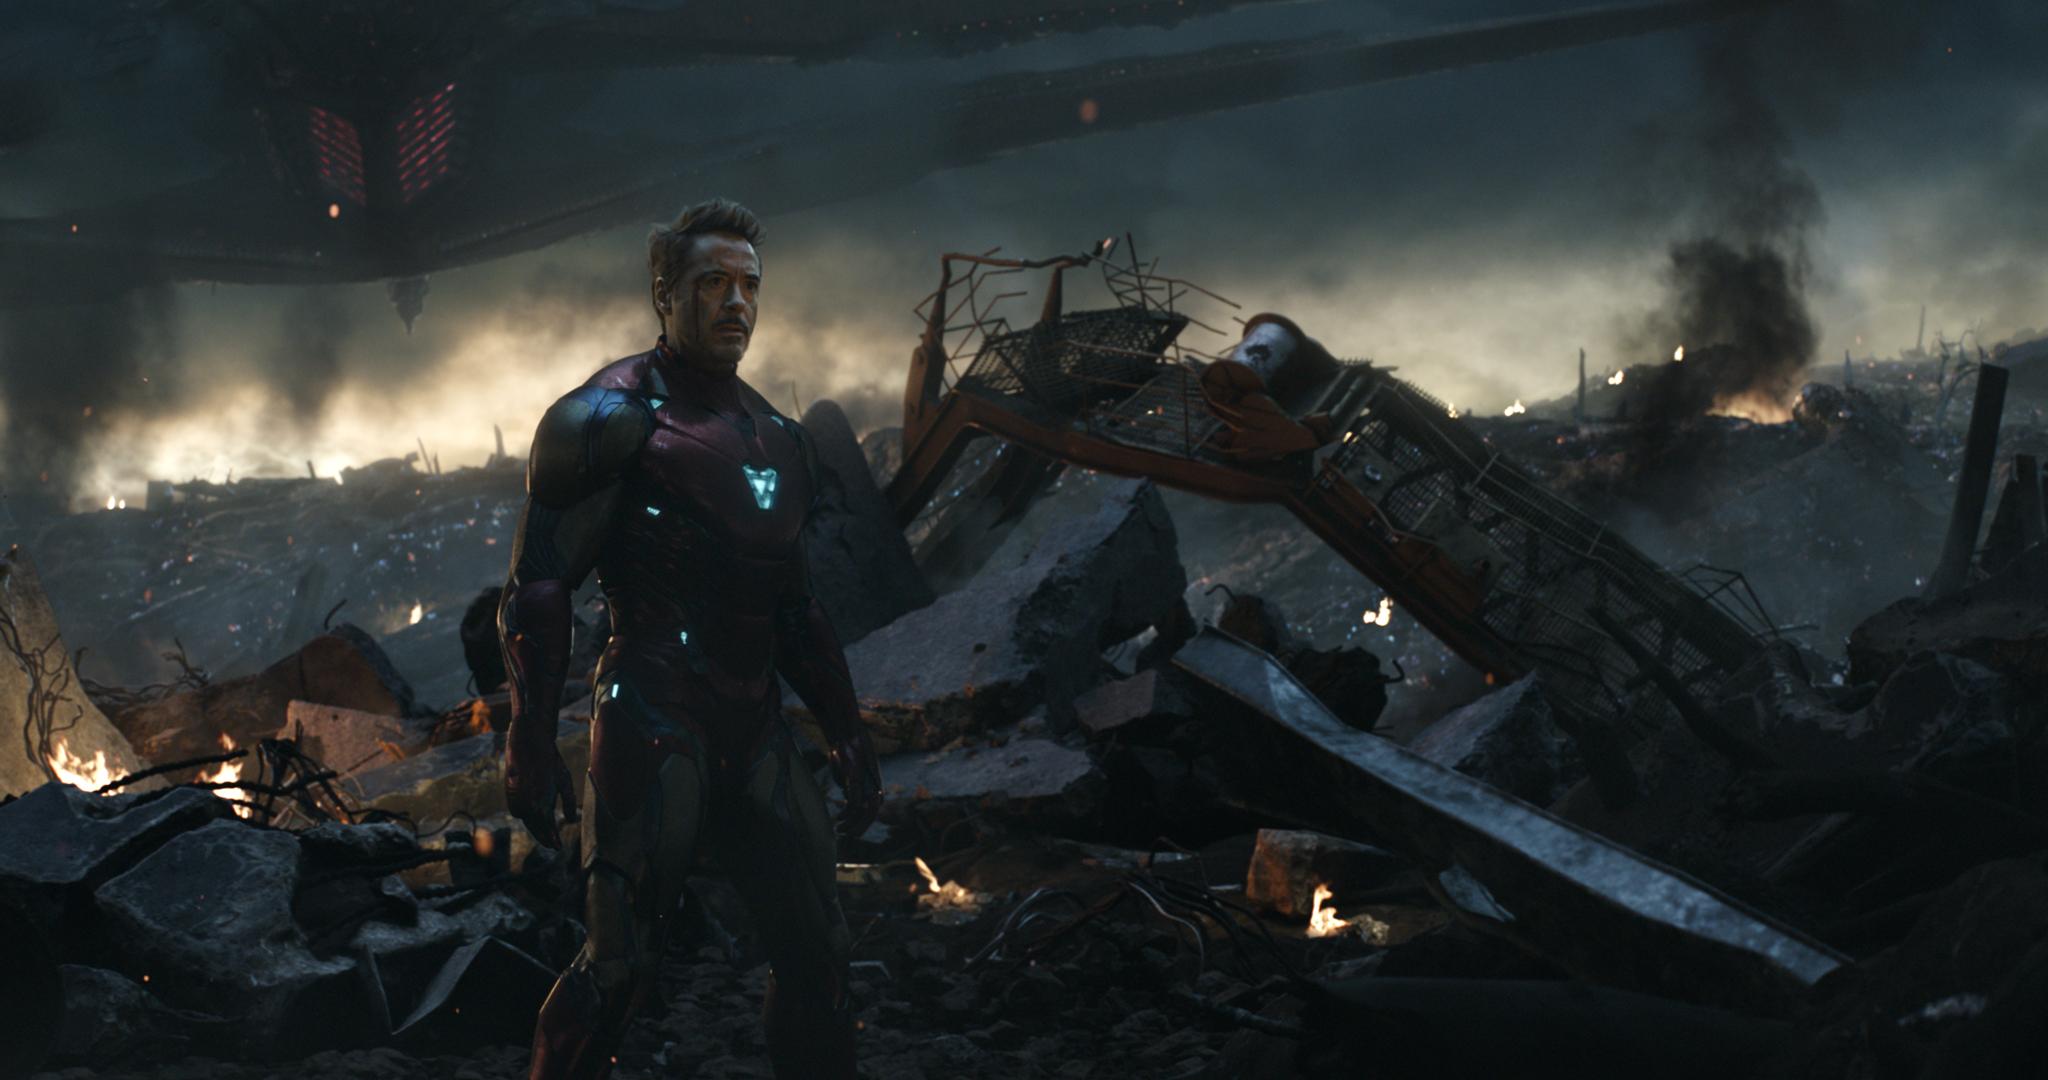 Avengers Endgame 2019 Photo Gallery Imdb